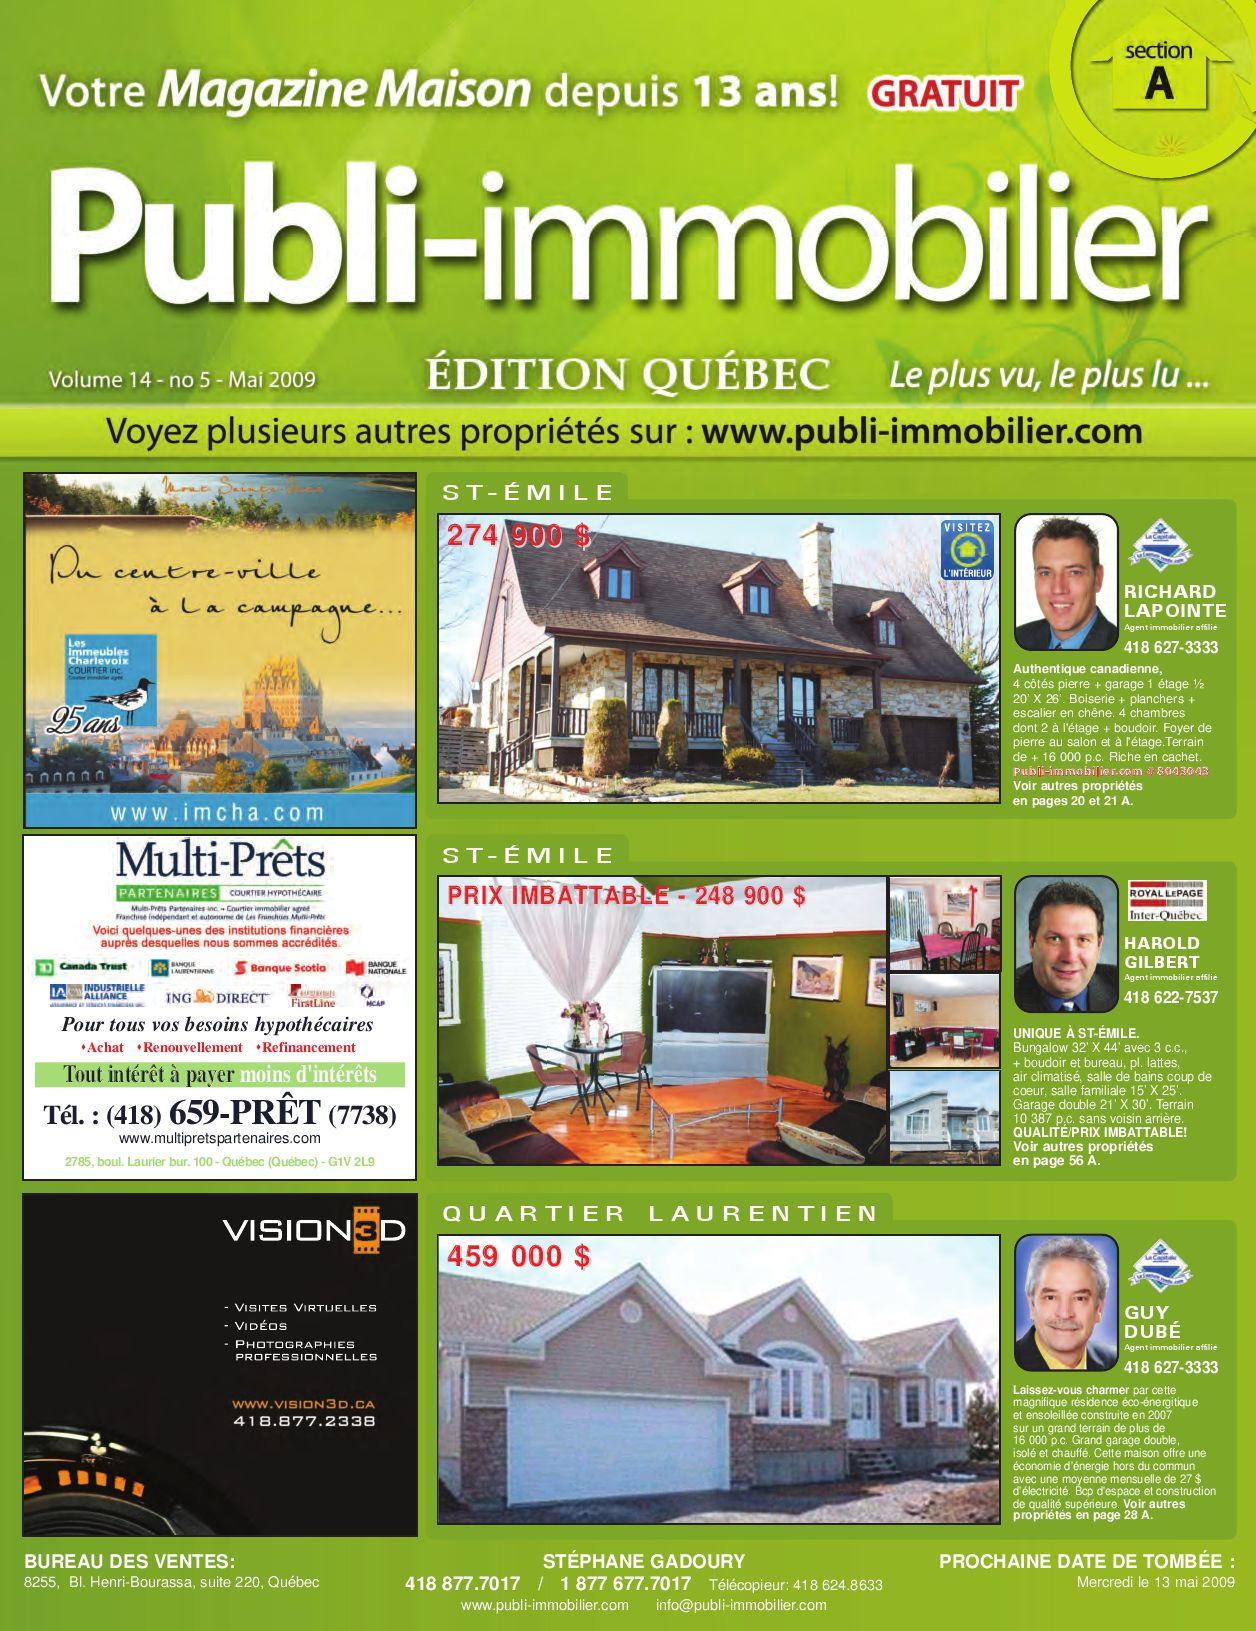 Publi immobilier volume 14 no 5 mai 2009 by lepubli for 20 volume salon gilbert